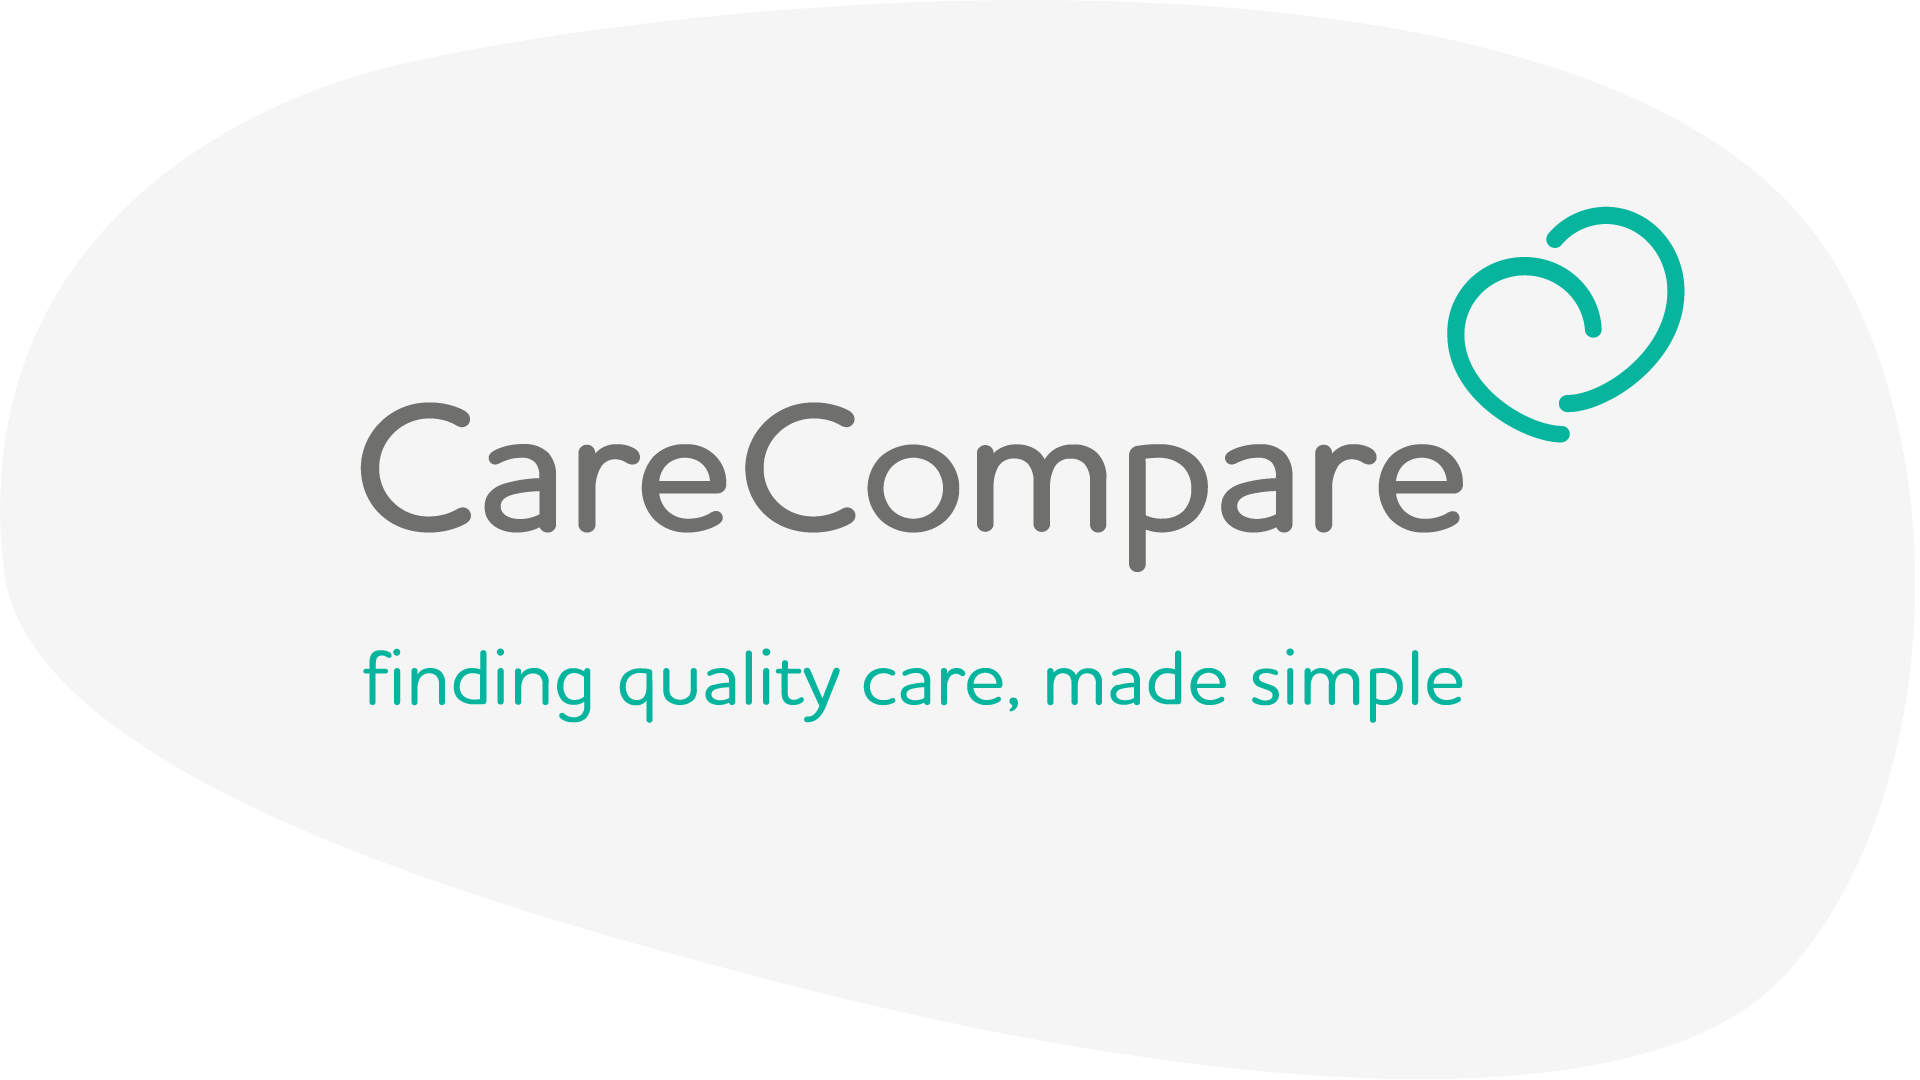 New CareCompare logo with tagline, inside a shape